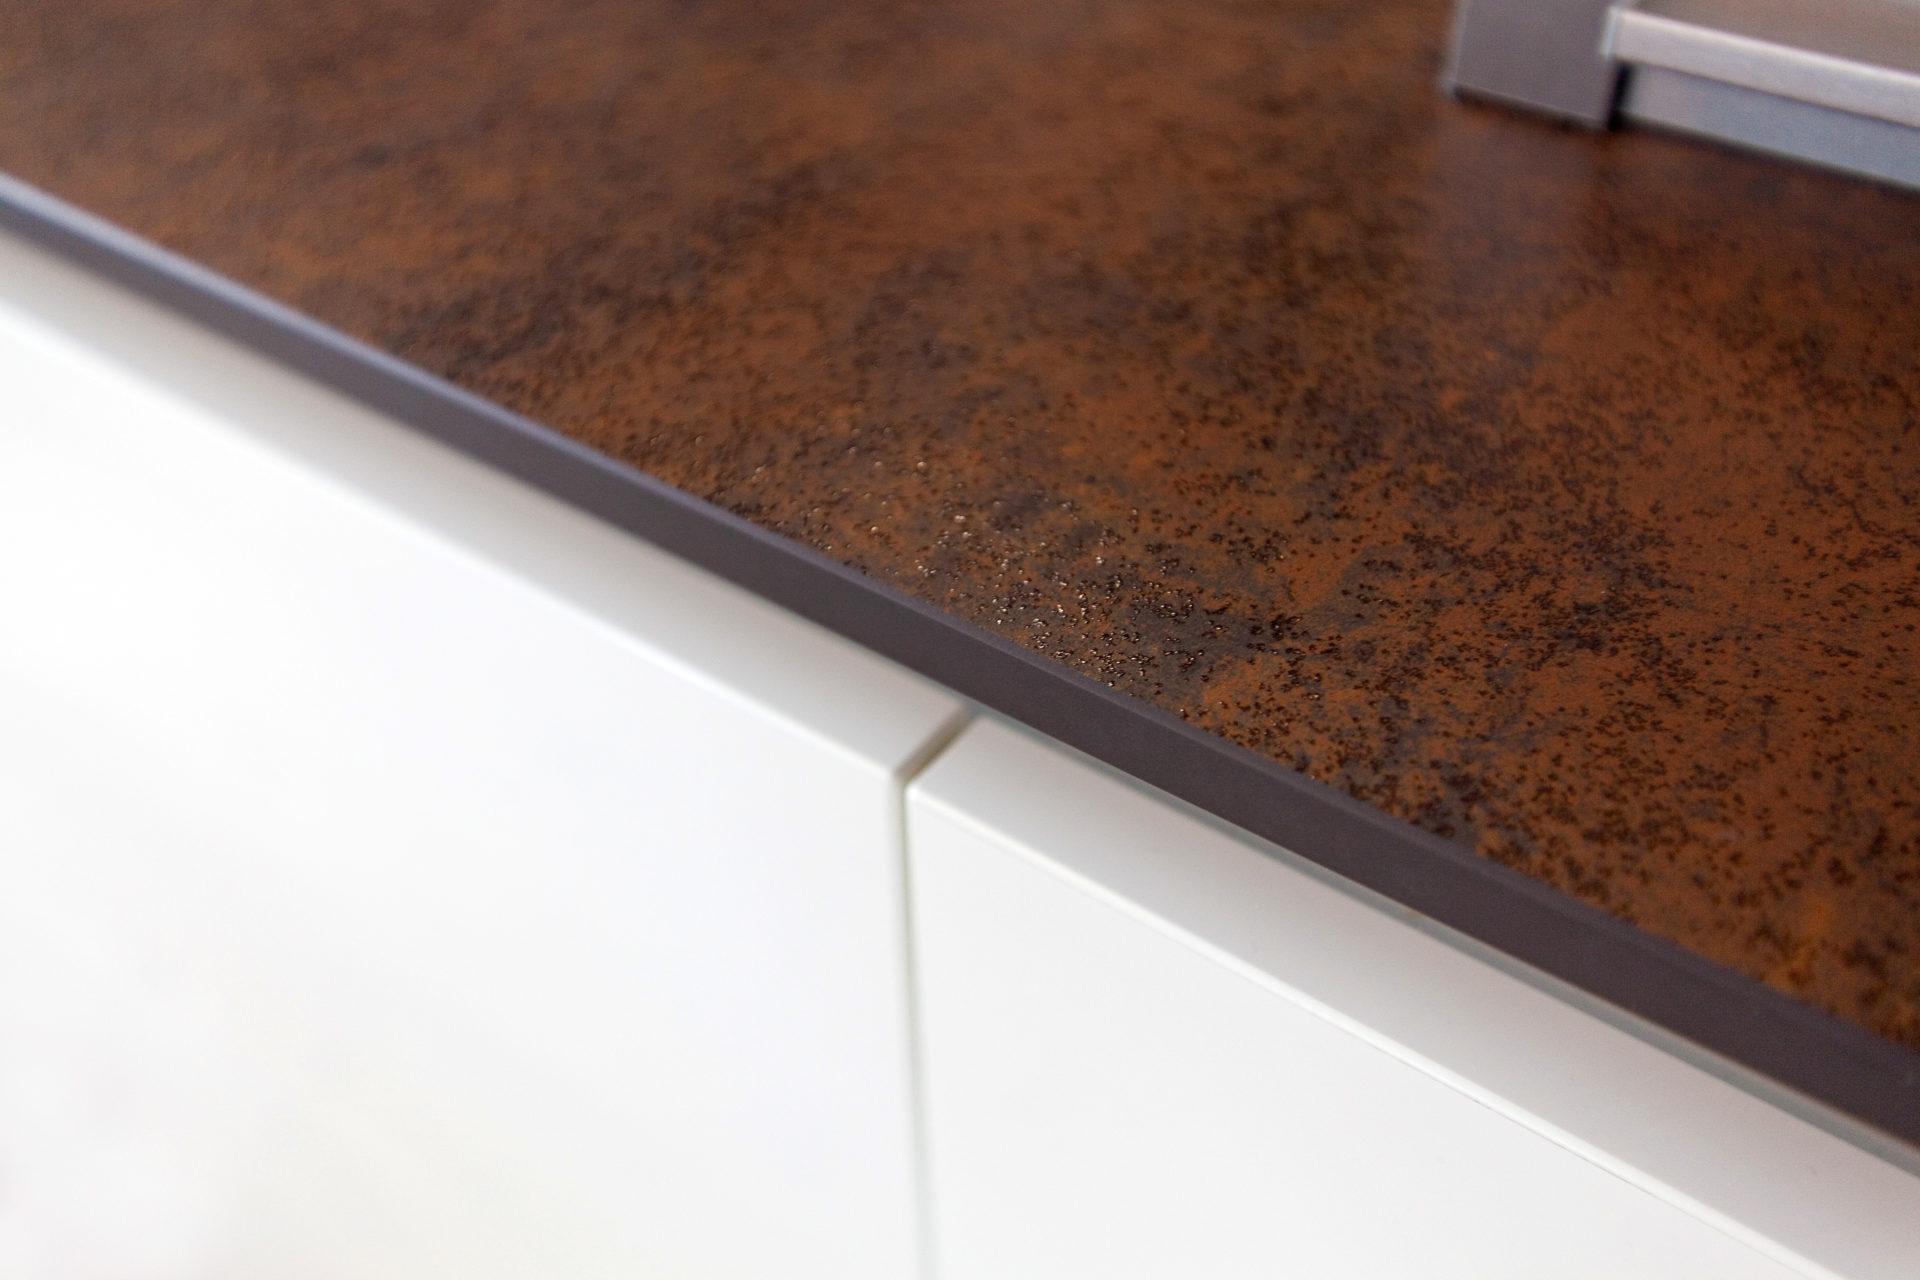 Kueche Overath Weiss Granit Modern Grifflos Bora Miele 032